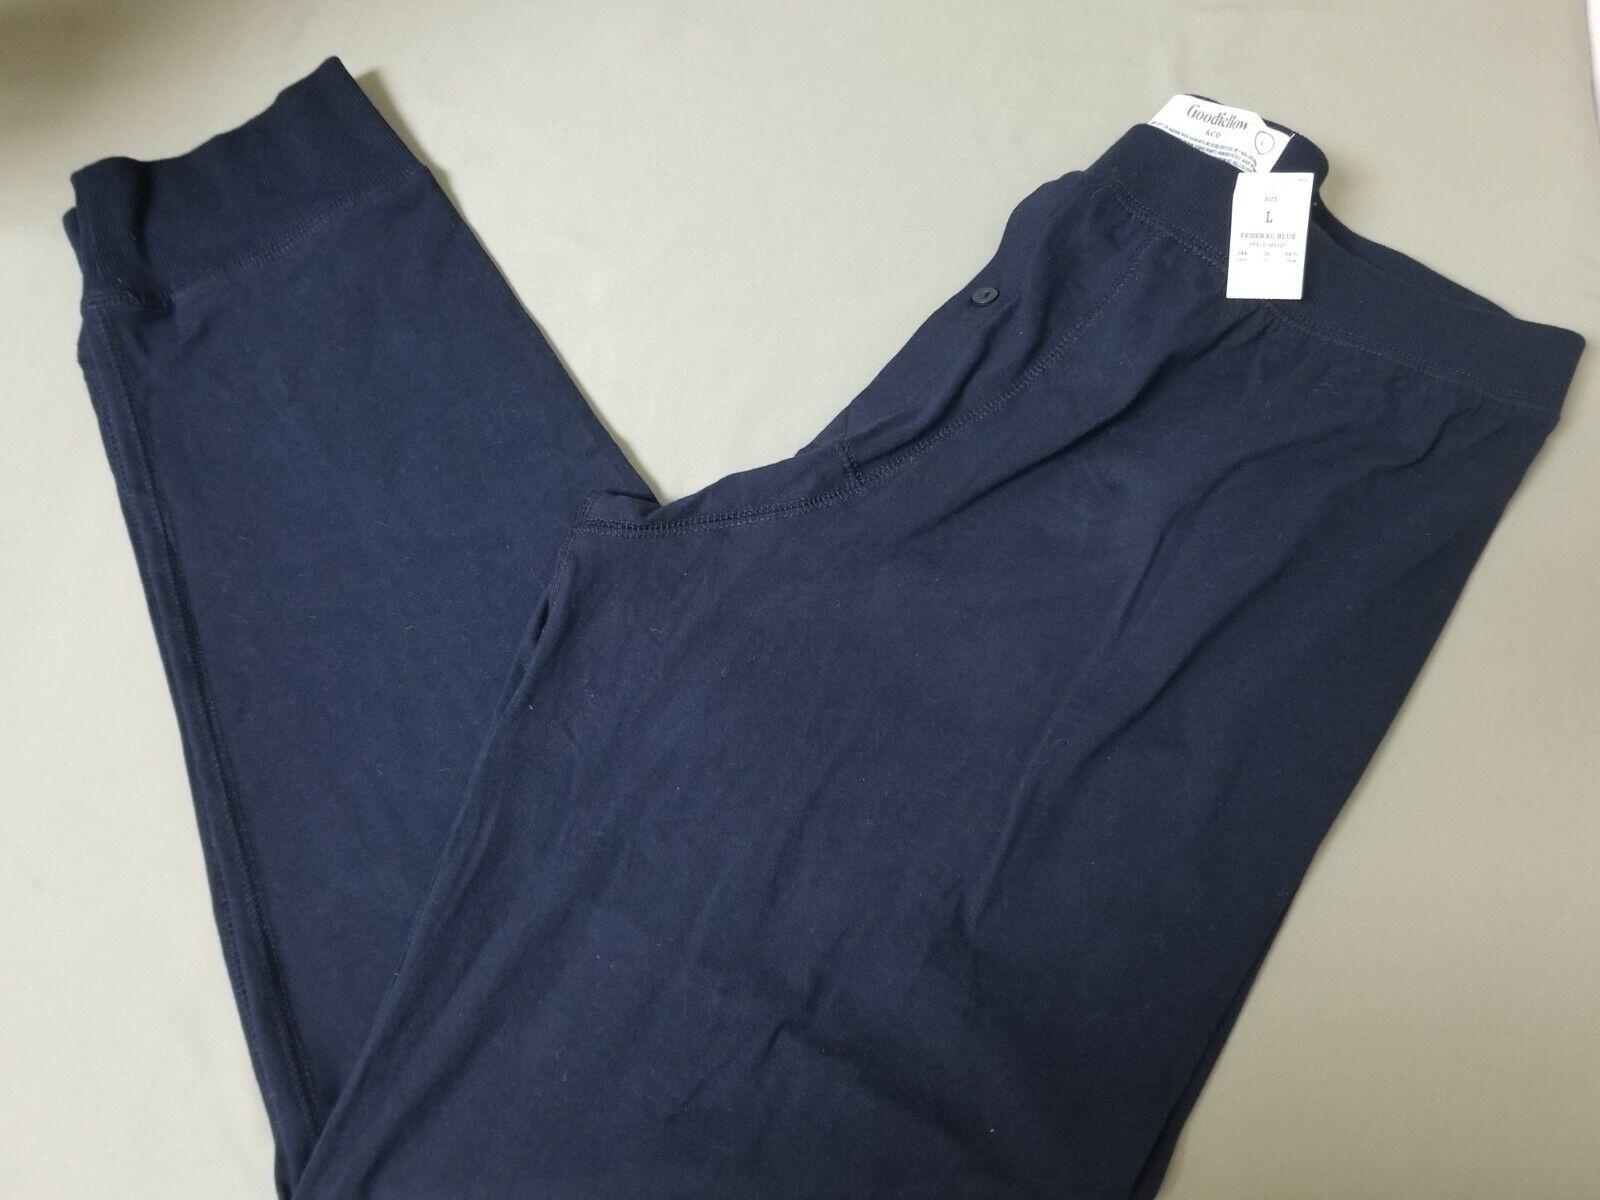 New Mens Goodfellow /& Co Sleepwear Jogger Lounge Pants.